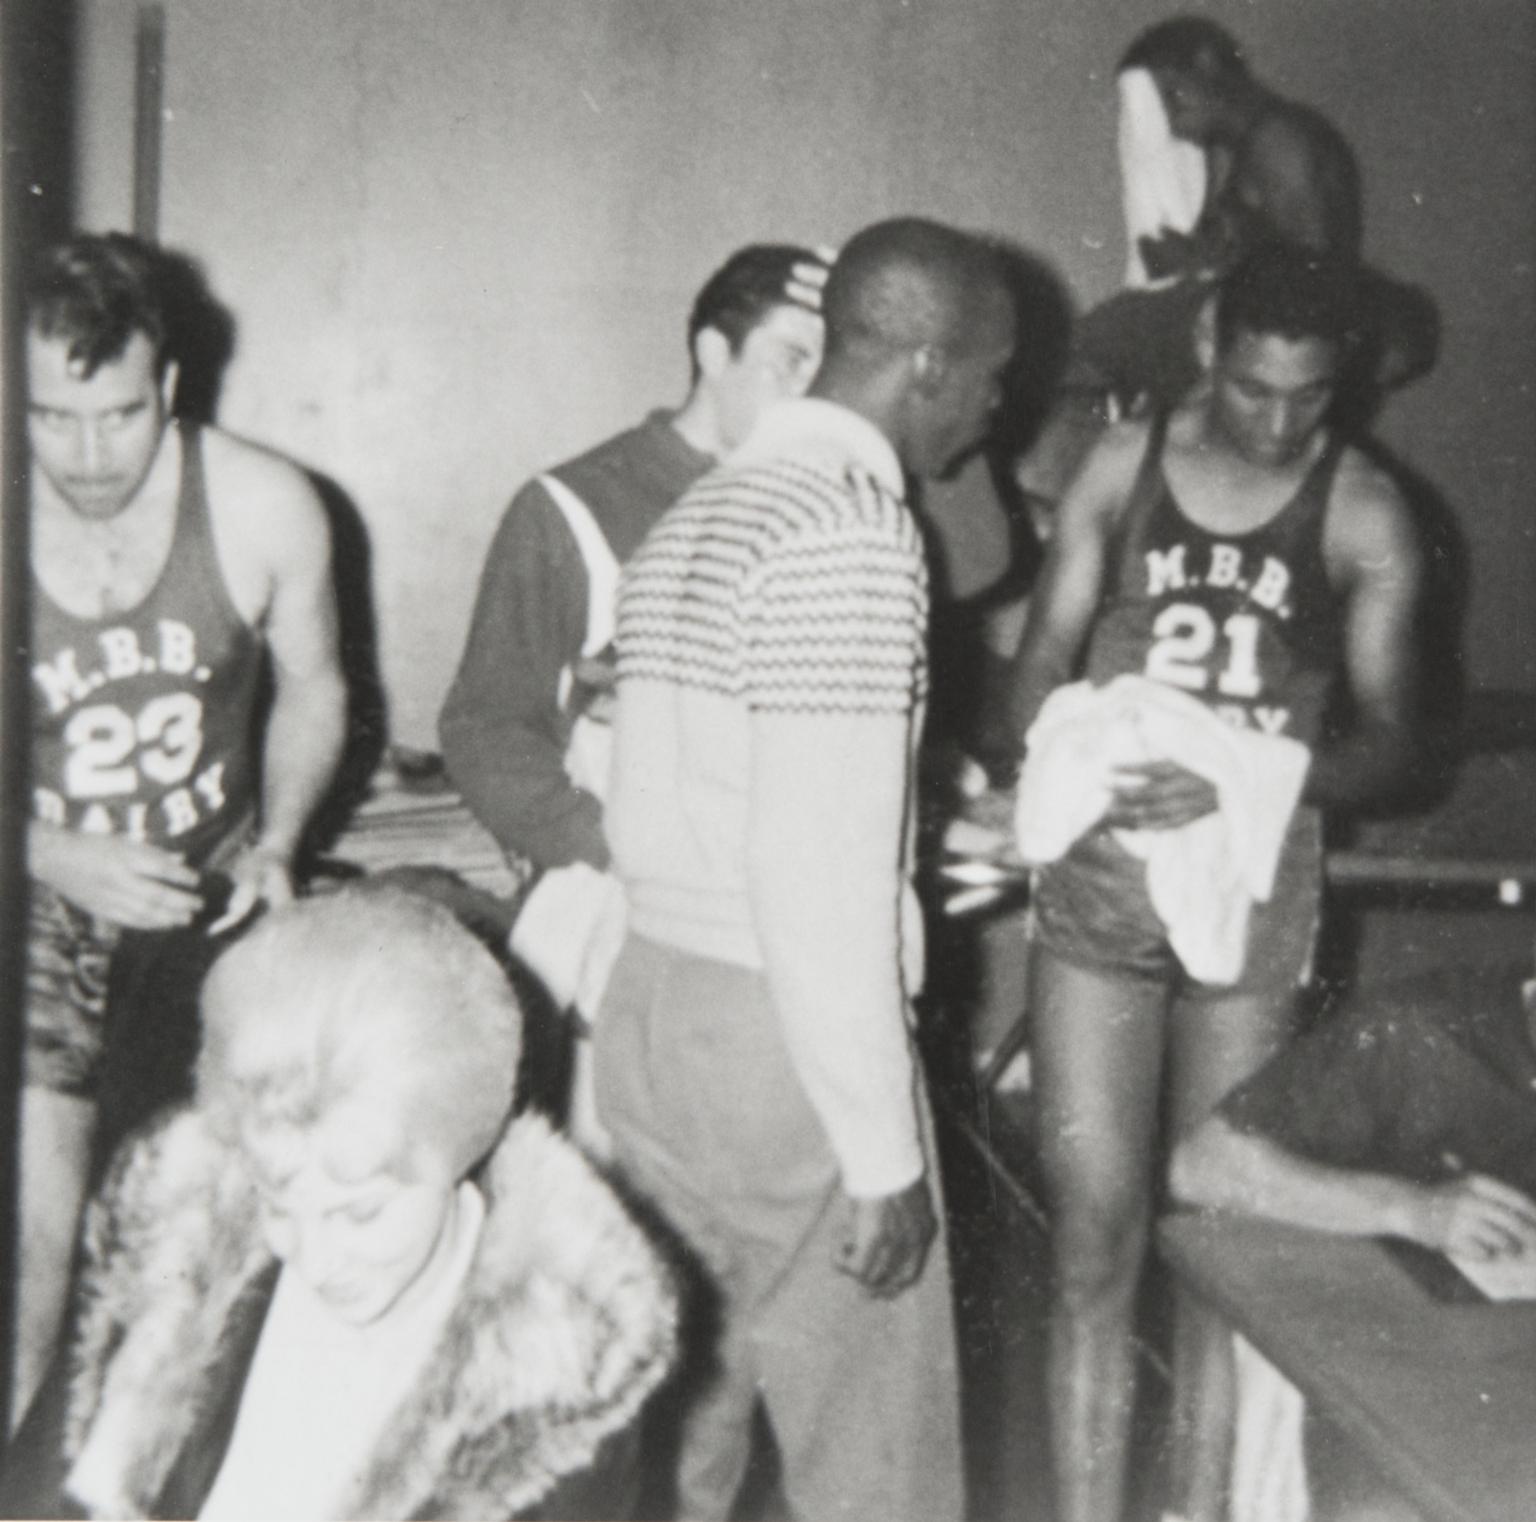 Santa Maria High School Gym, John B. Sirls and J. Wilson : late 1950s.